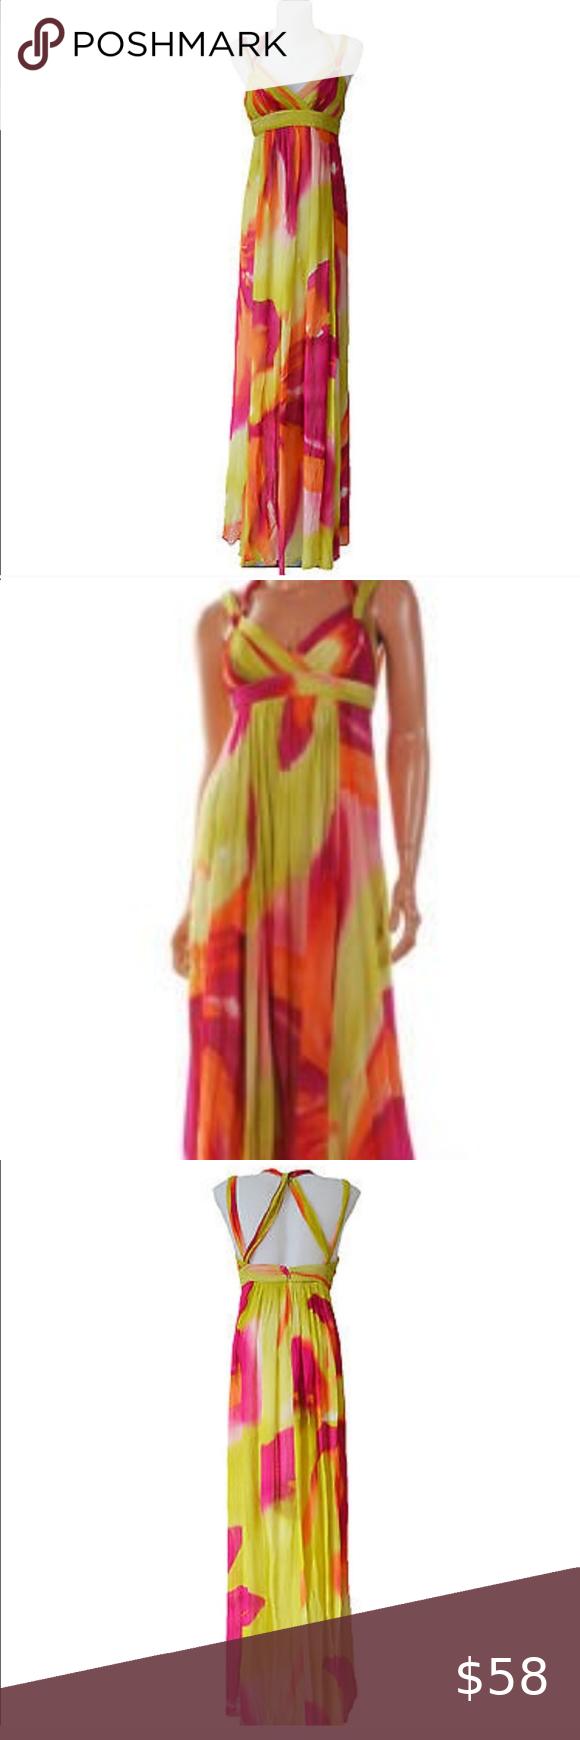 Bcbg Maxazria Lime Fuschia Chiffon Maxi Dress Gorgeous Chiffon Maxi Dress Colors Are Lime Fuschia And Tangerin Chiffon Maxi Dress Dresses Gorgeous Dresses [ 1740 x 580 Pixel ]